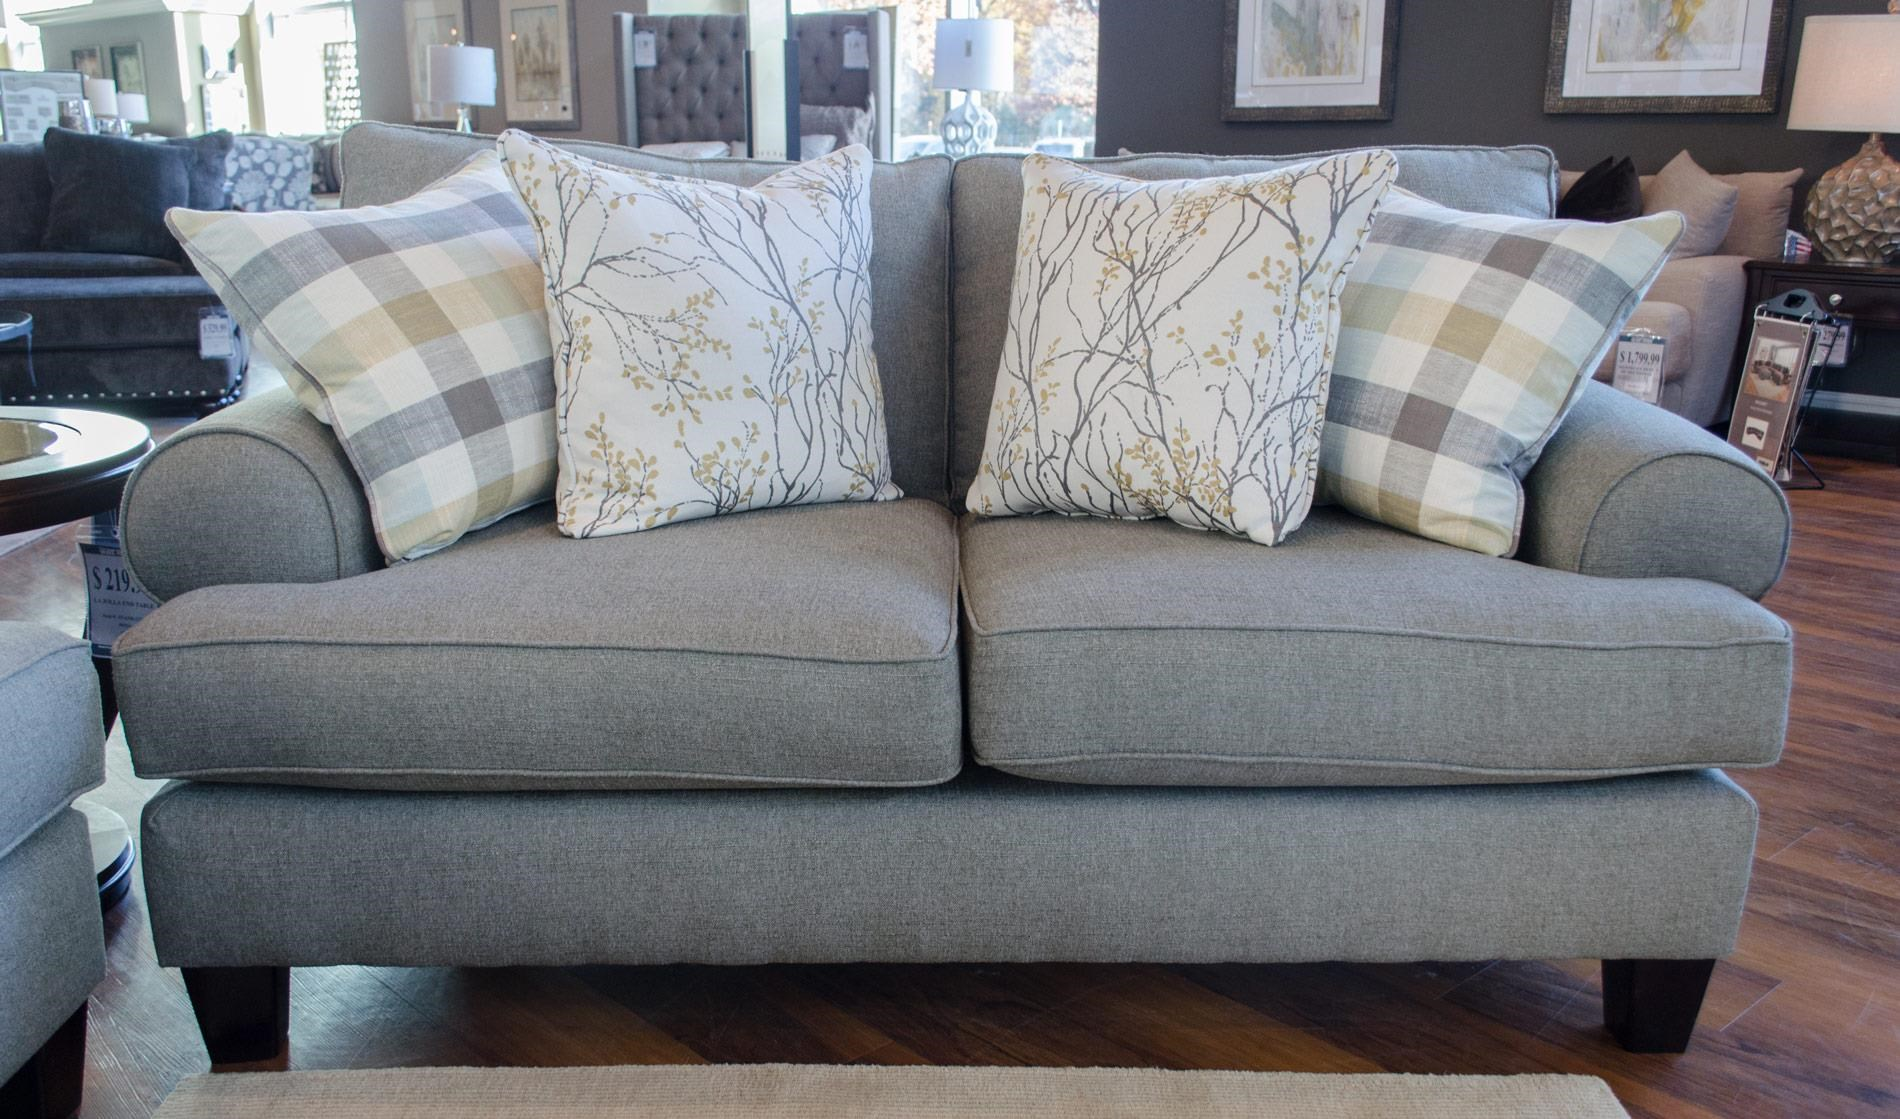 Fusion Furniture 4200 Boho Birch Loveseat - Item Number: 4201 BOHO-WEAVE-BIRCH